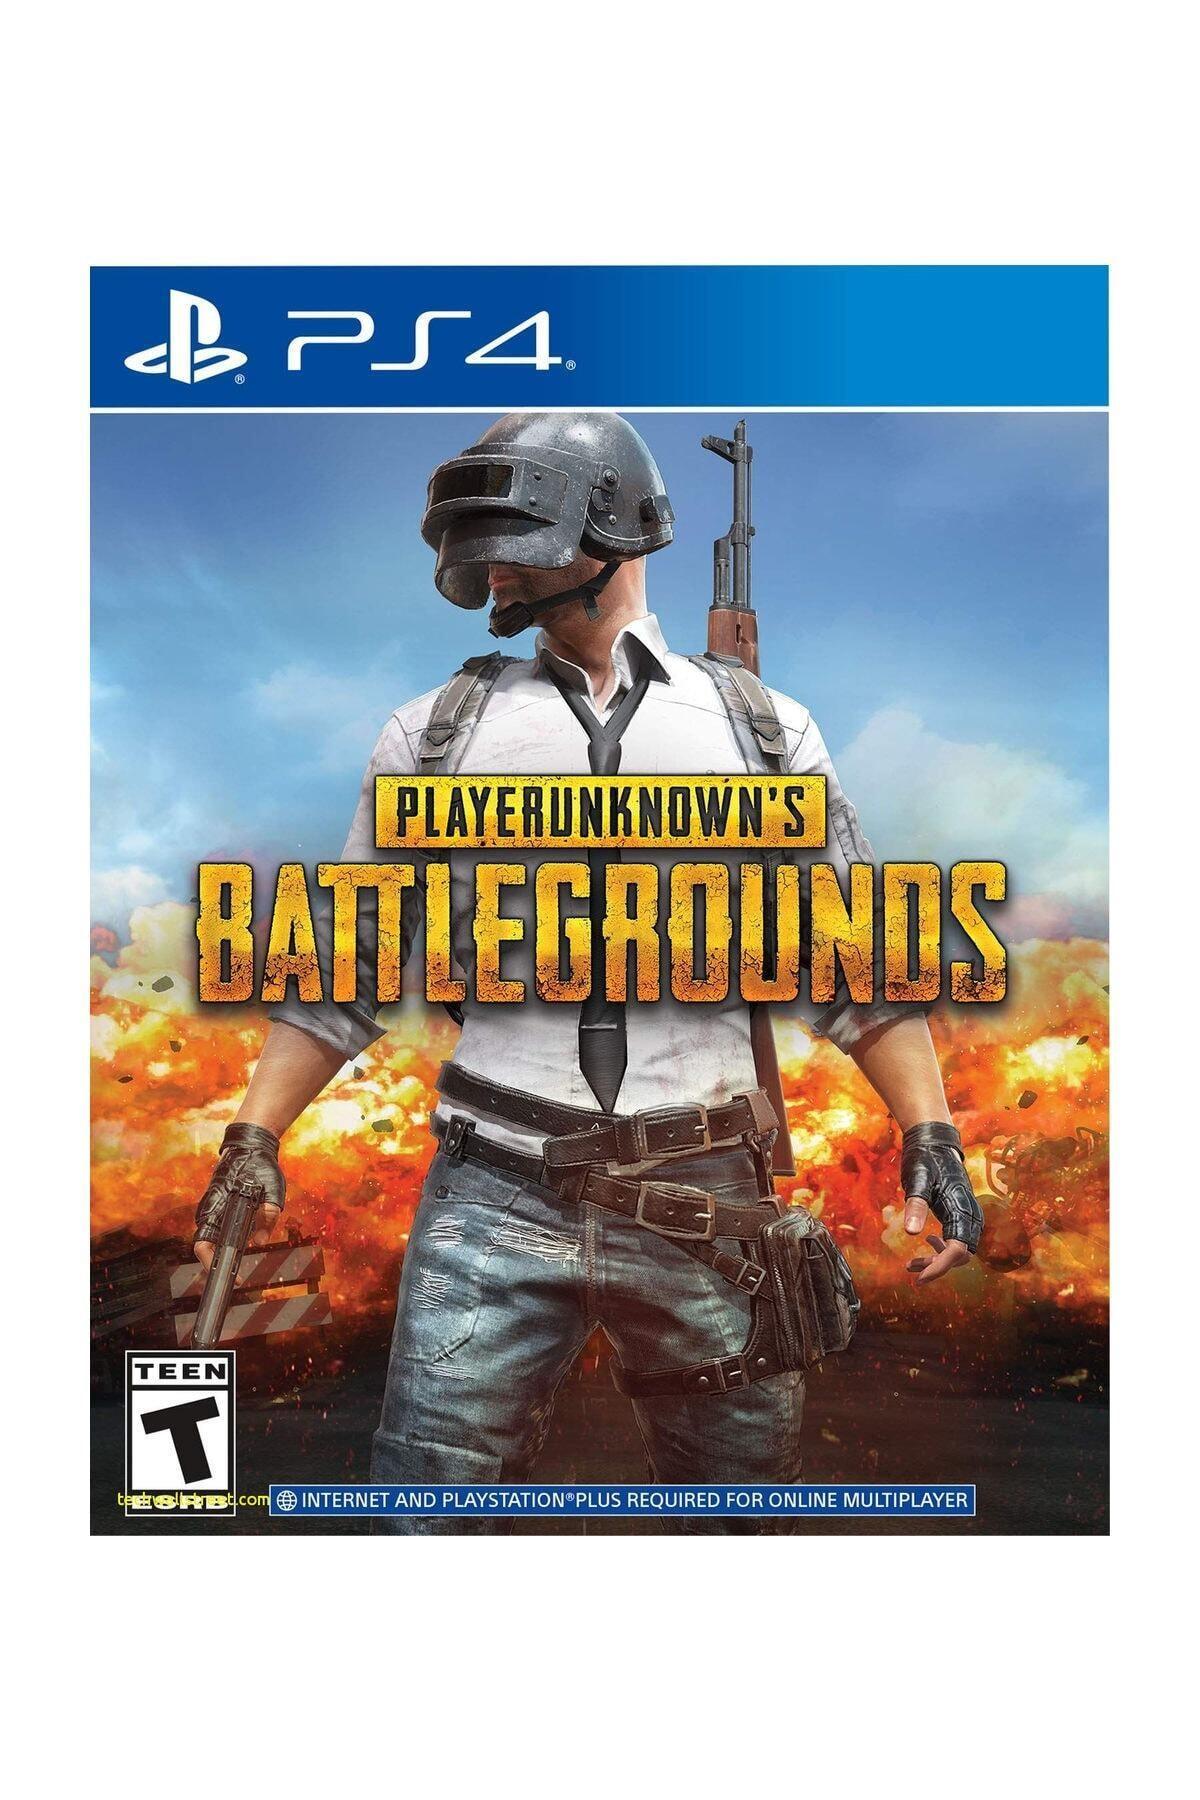 Sony Playerunknown's Battlegrounds (Pubg) Ps4 Oyun - Türkçe 1